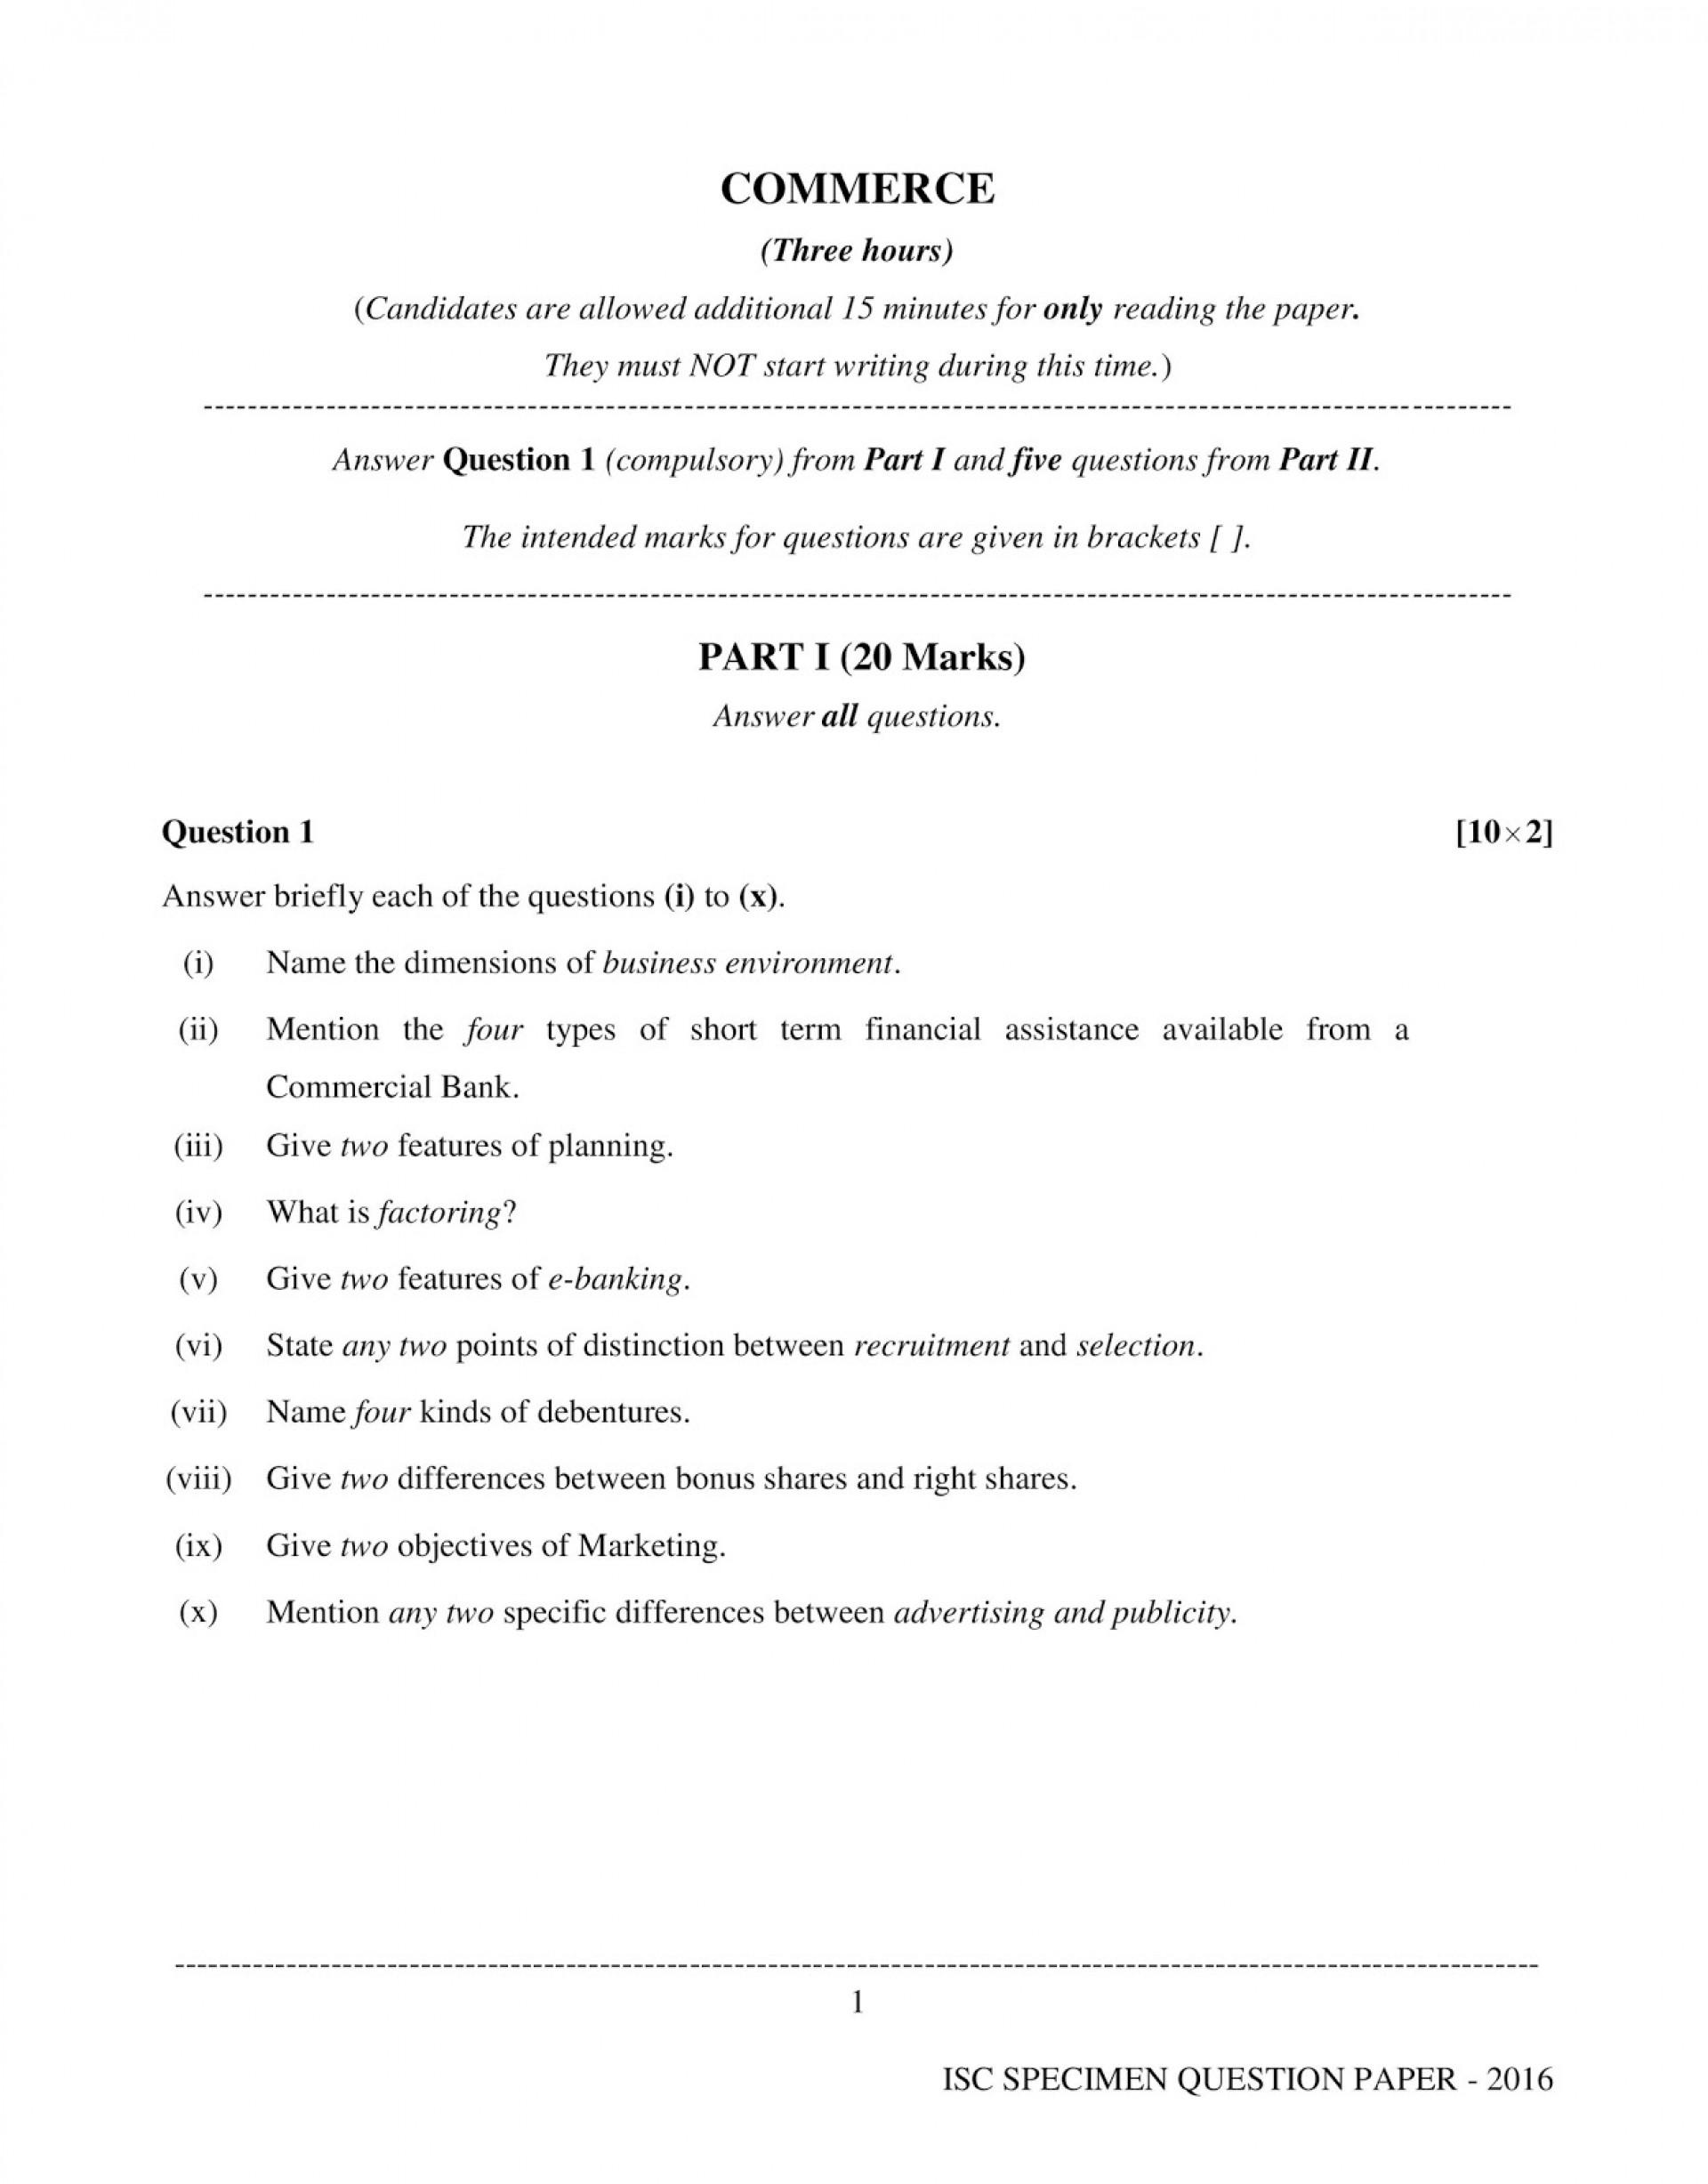 003 Essay Example Schizophrenia Commerce Specimen Paper Class Page Shocking Topics Free Conclusion 1920